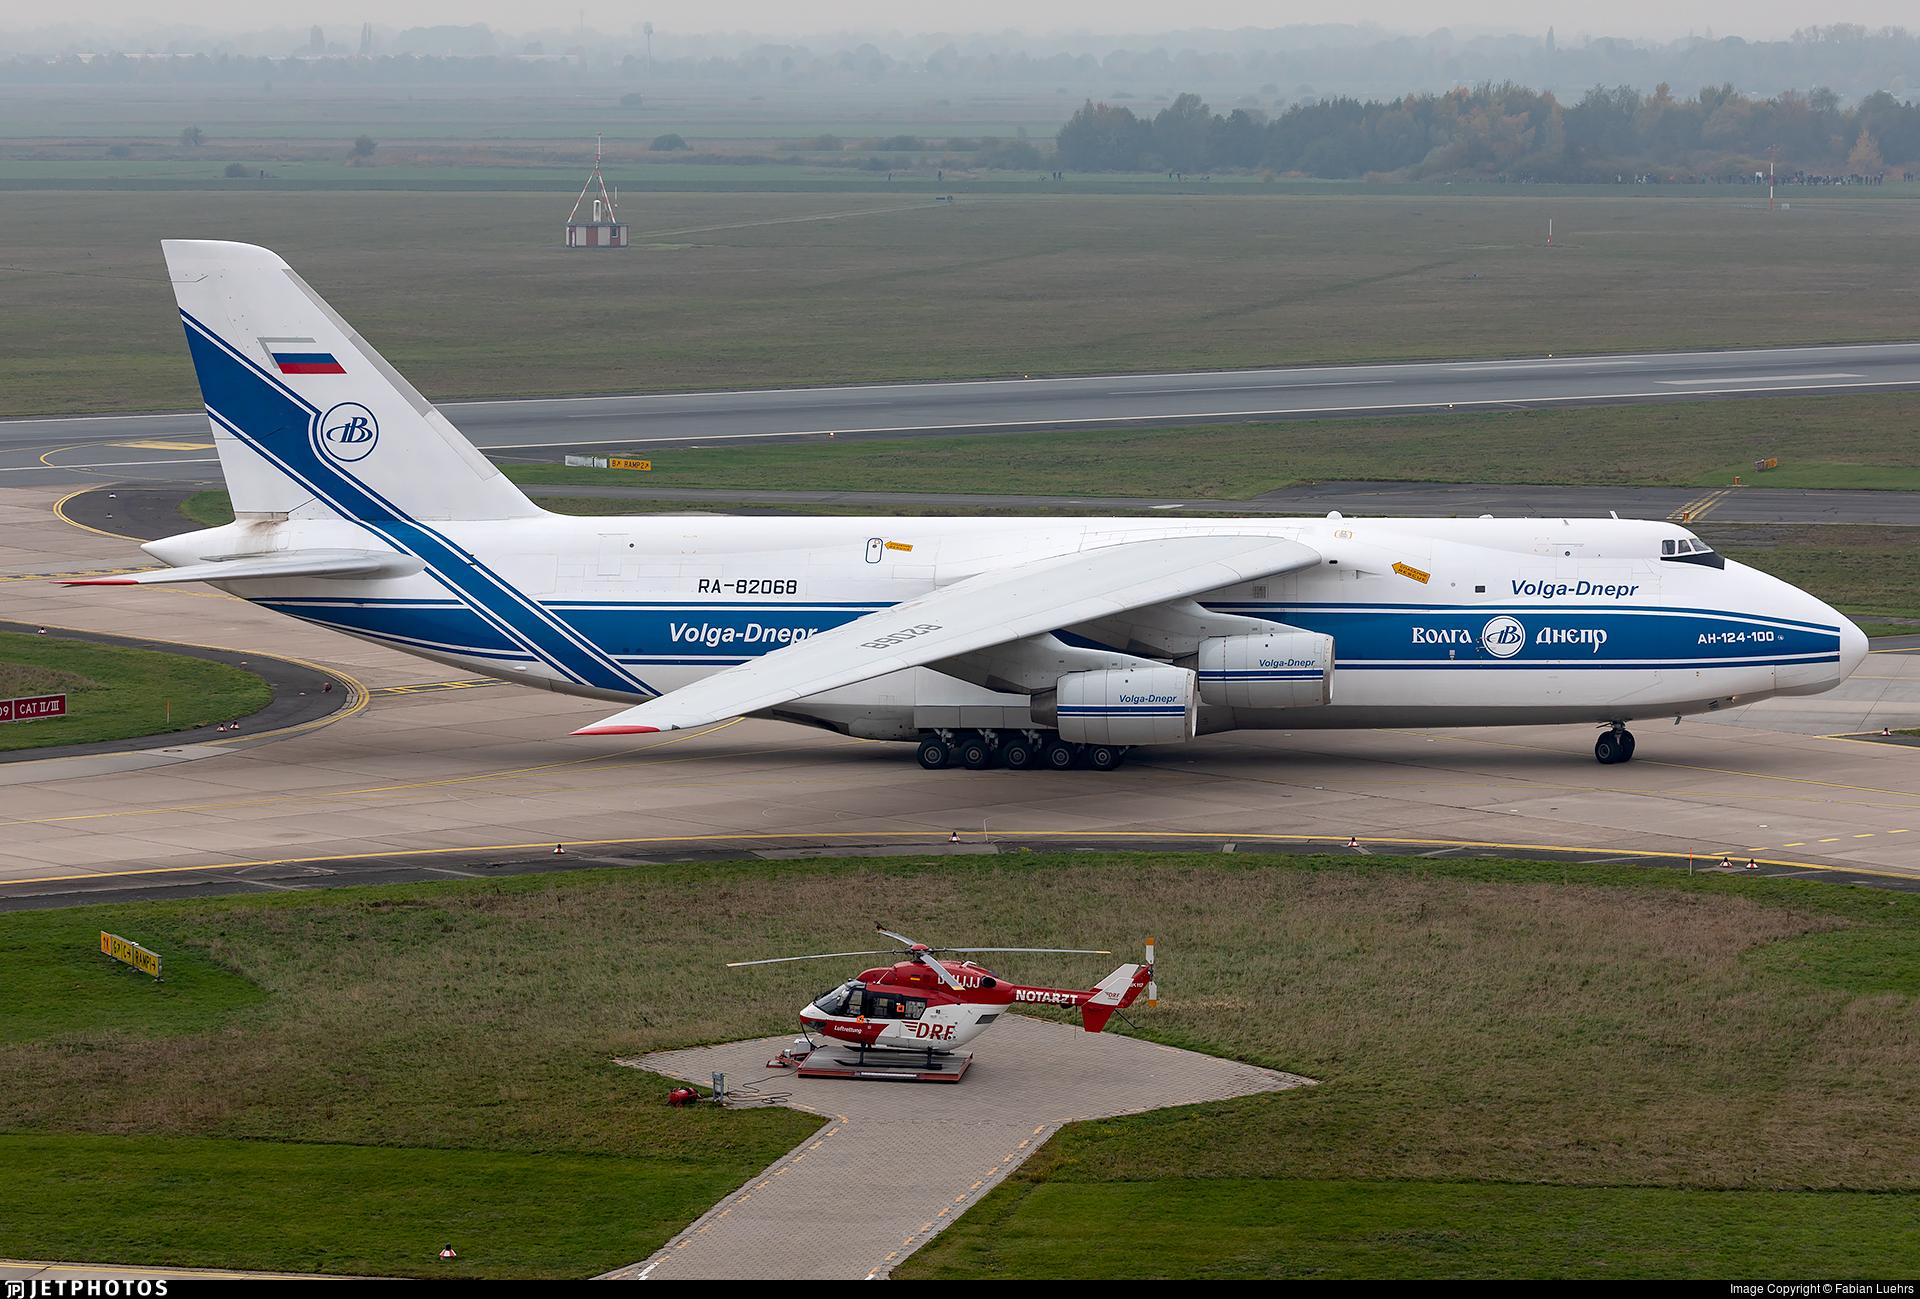 RA-82068 - Antonov An-124-100 Ruslan - Volga Dnepr Airlines